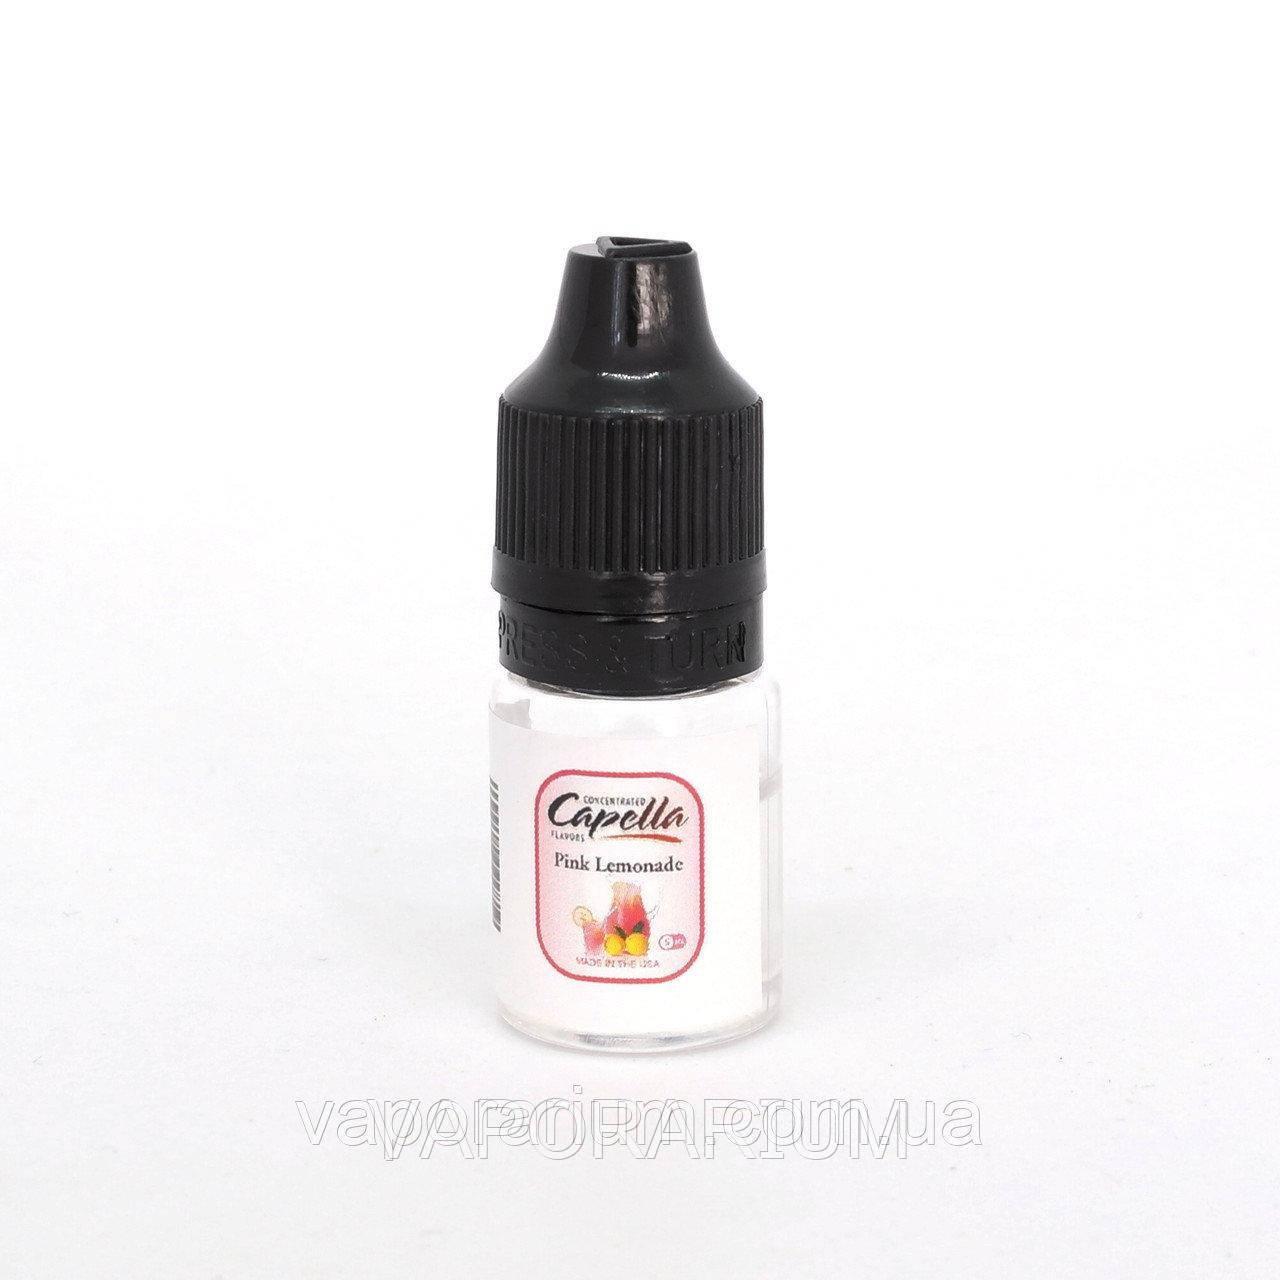 Ароматизатор Capella Pink Lemonade (Розовый лимонад) 5 мл. (0223)